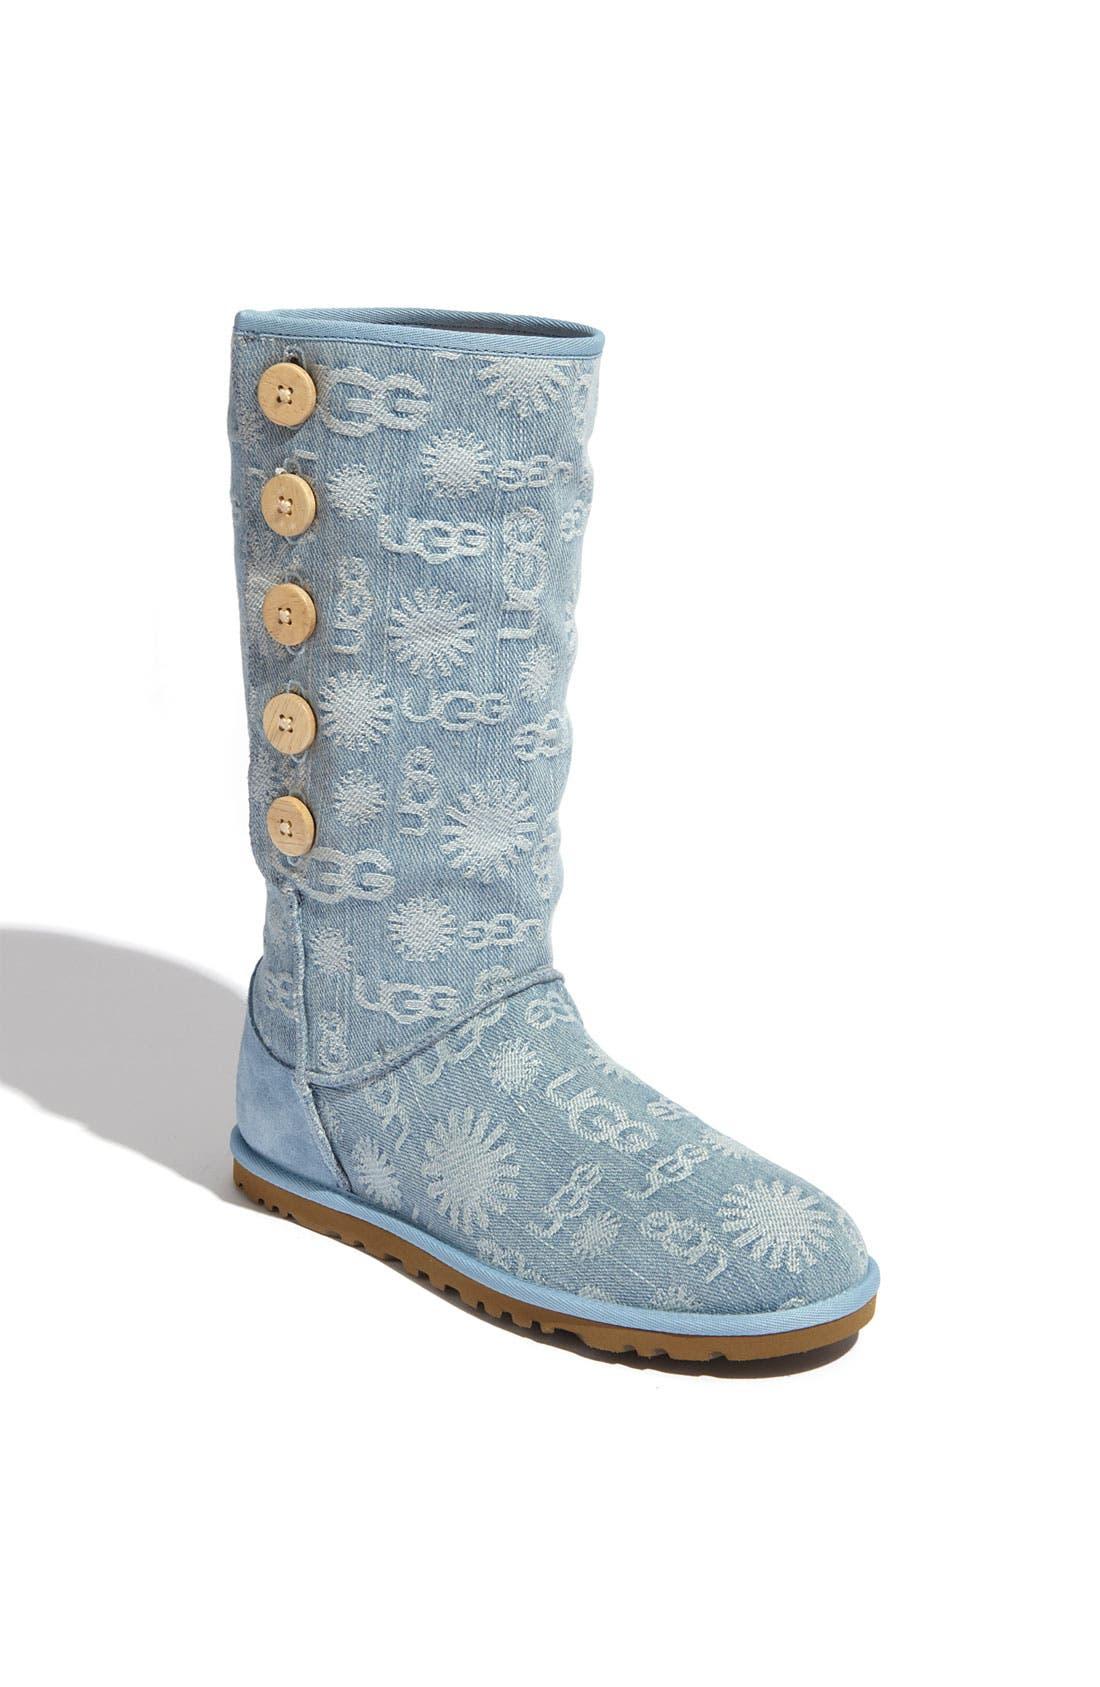 Alternate Image 1 Selected - UGG® Australia 'Lo Pro' Boot (Women)